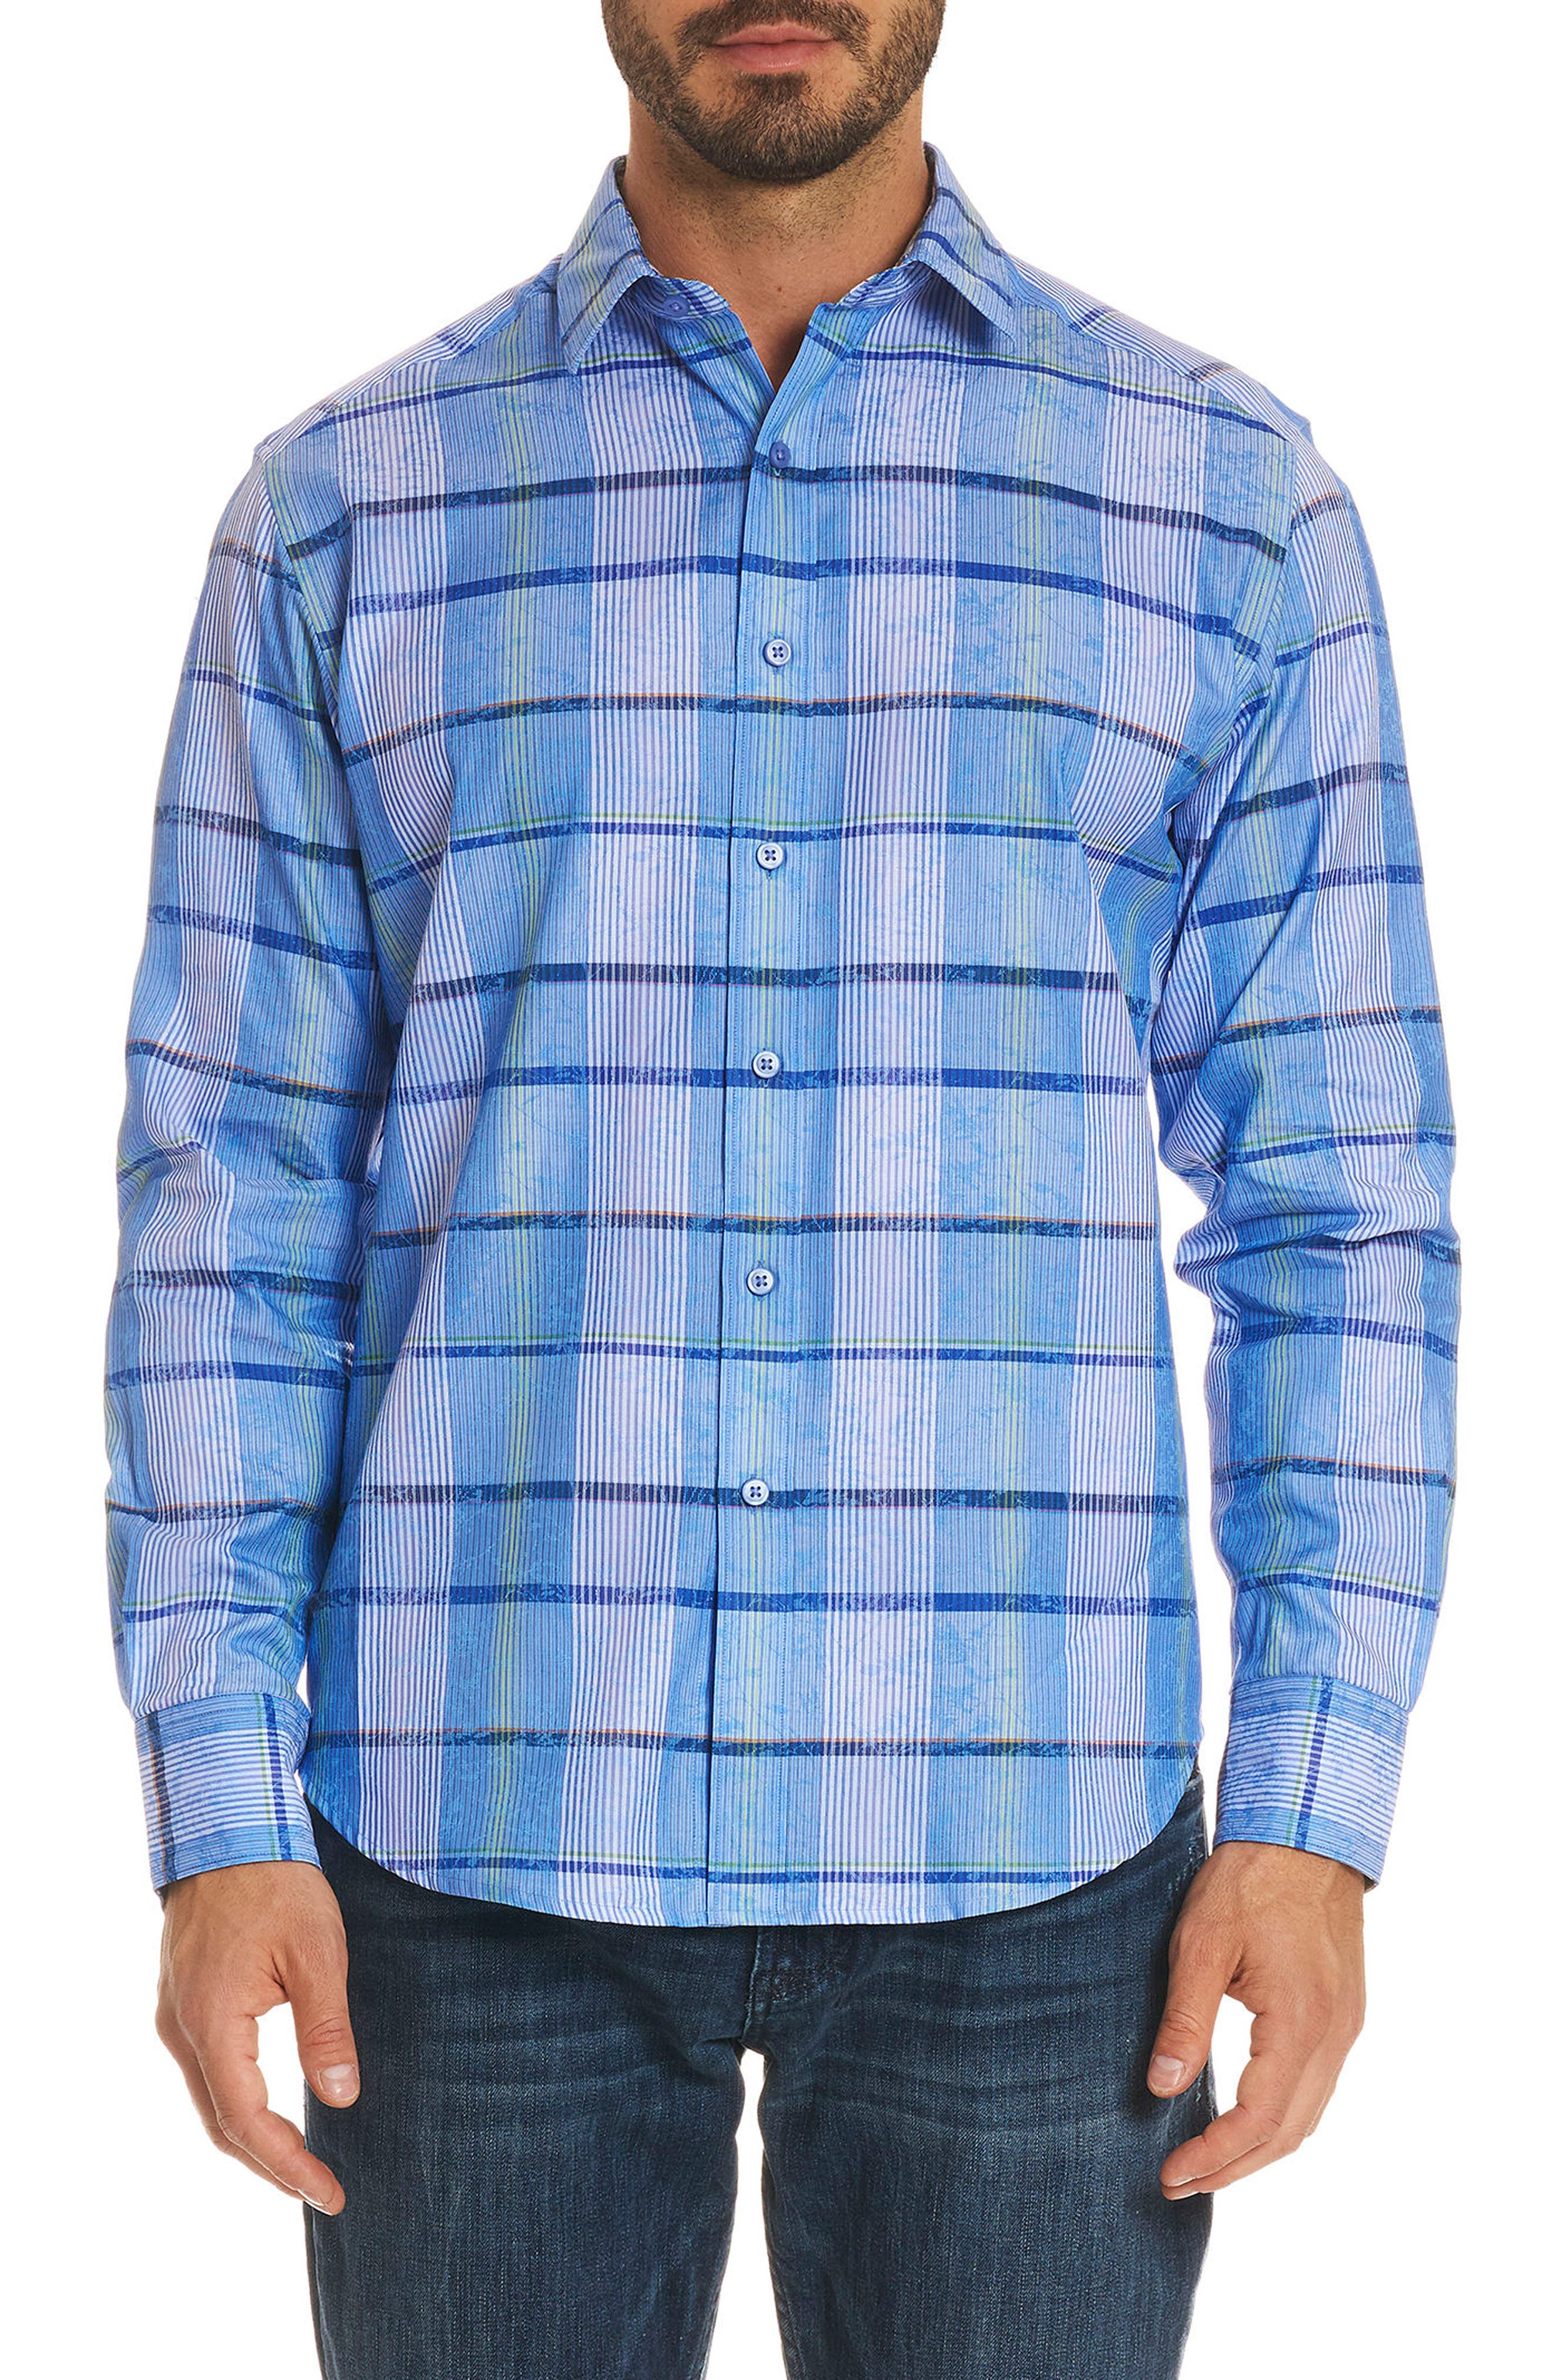 Ferro Classic Fit Sport Shirt,                             Main thumbnail 1, color,                             Blue